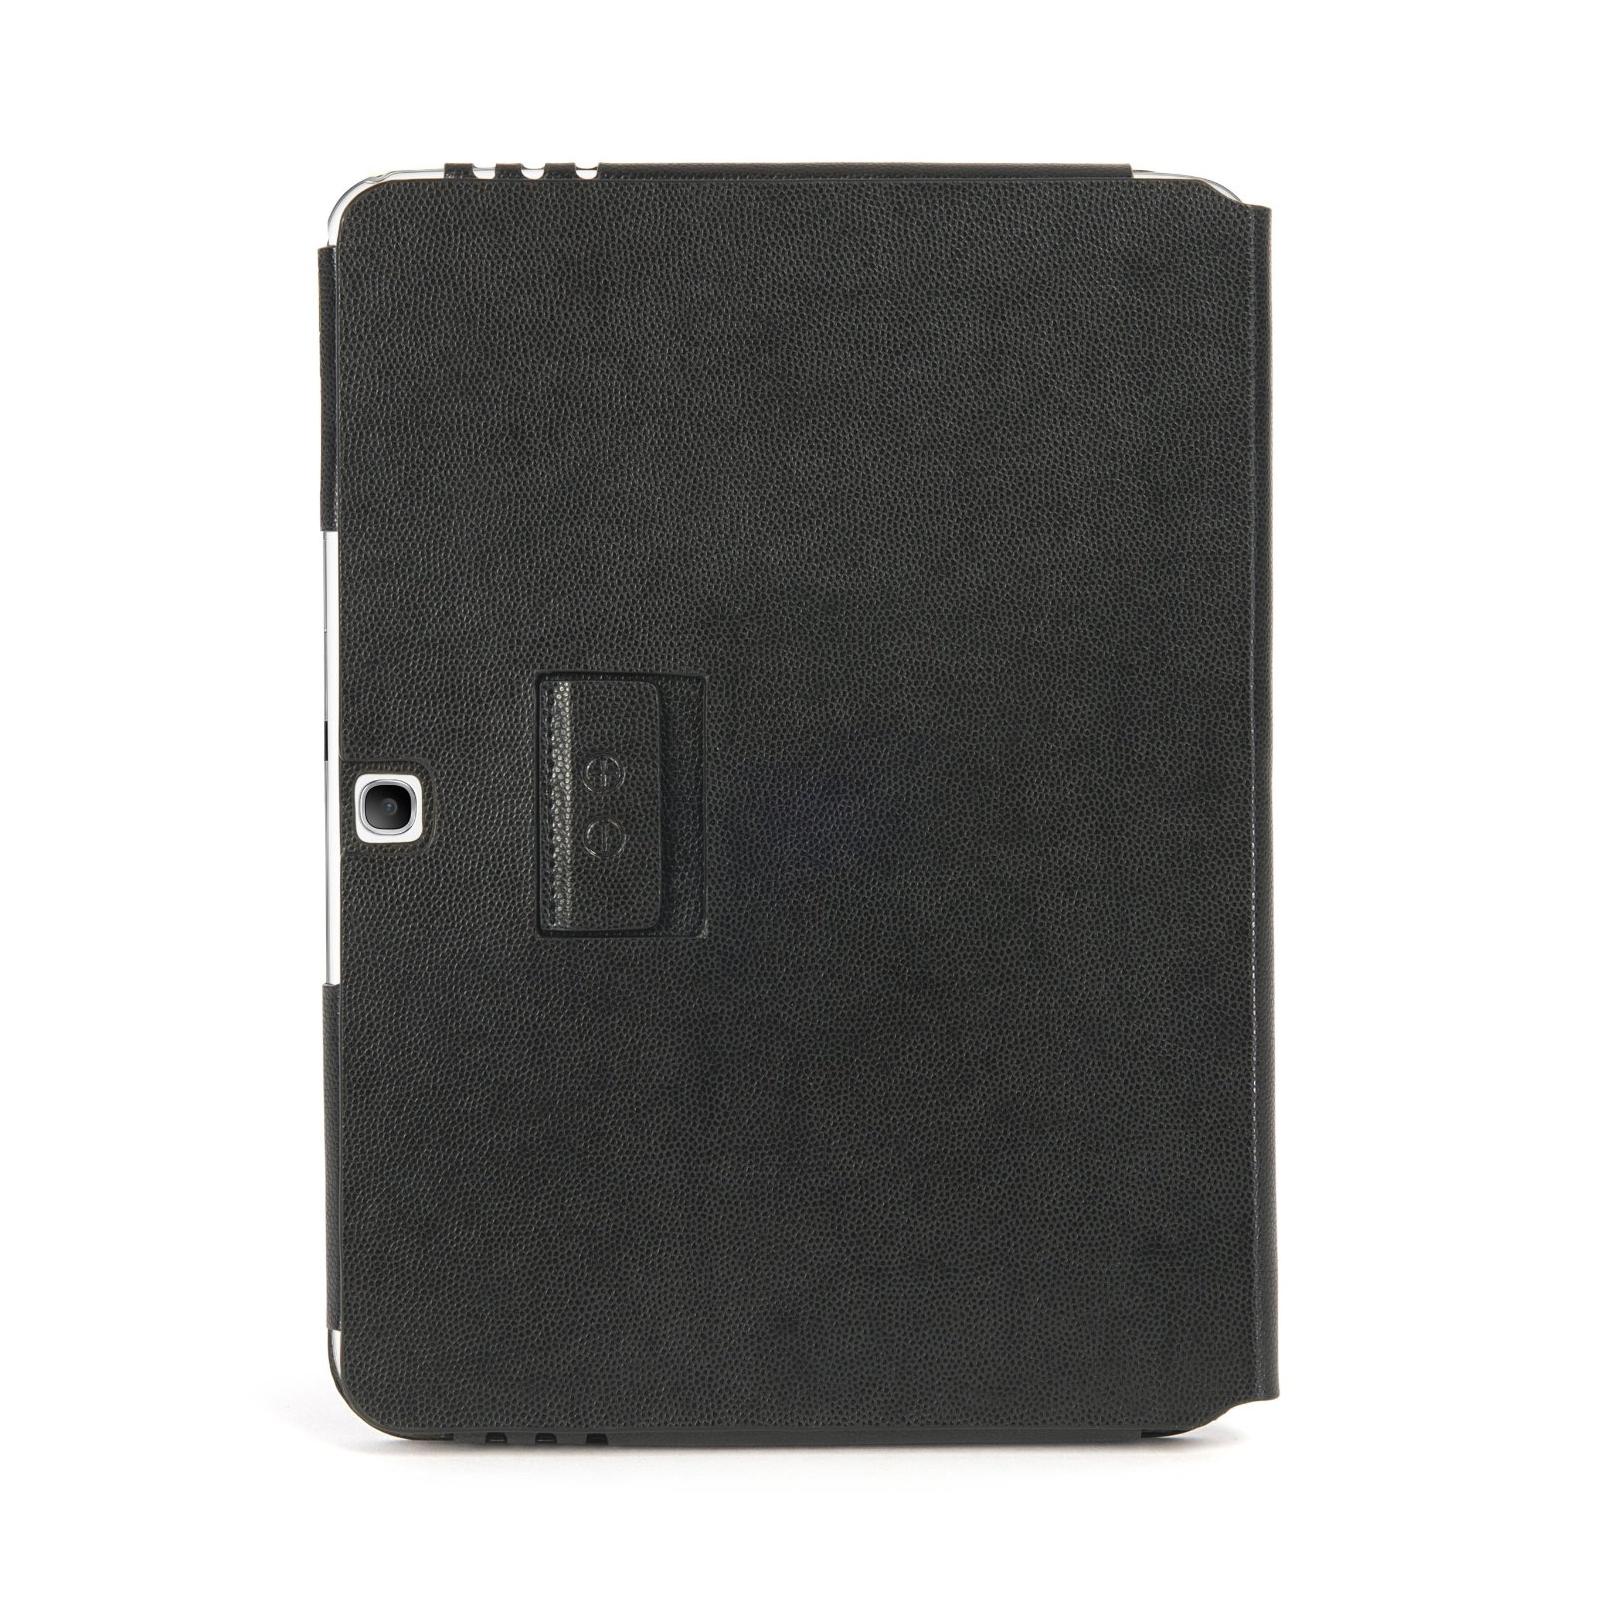 Чехол для планшета Tucano Galaxy Tab 3 10.1 Leggero Black (TAB-LS310) изображение 3